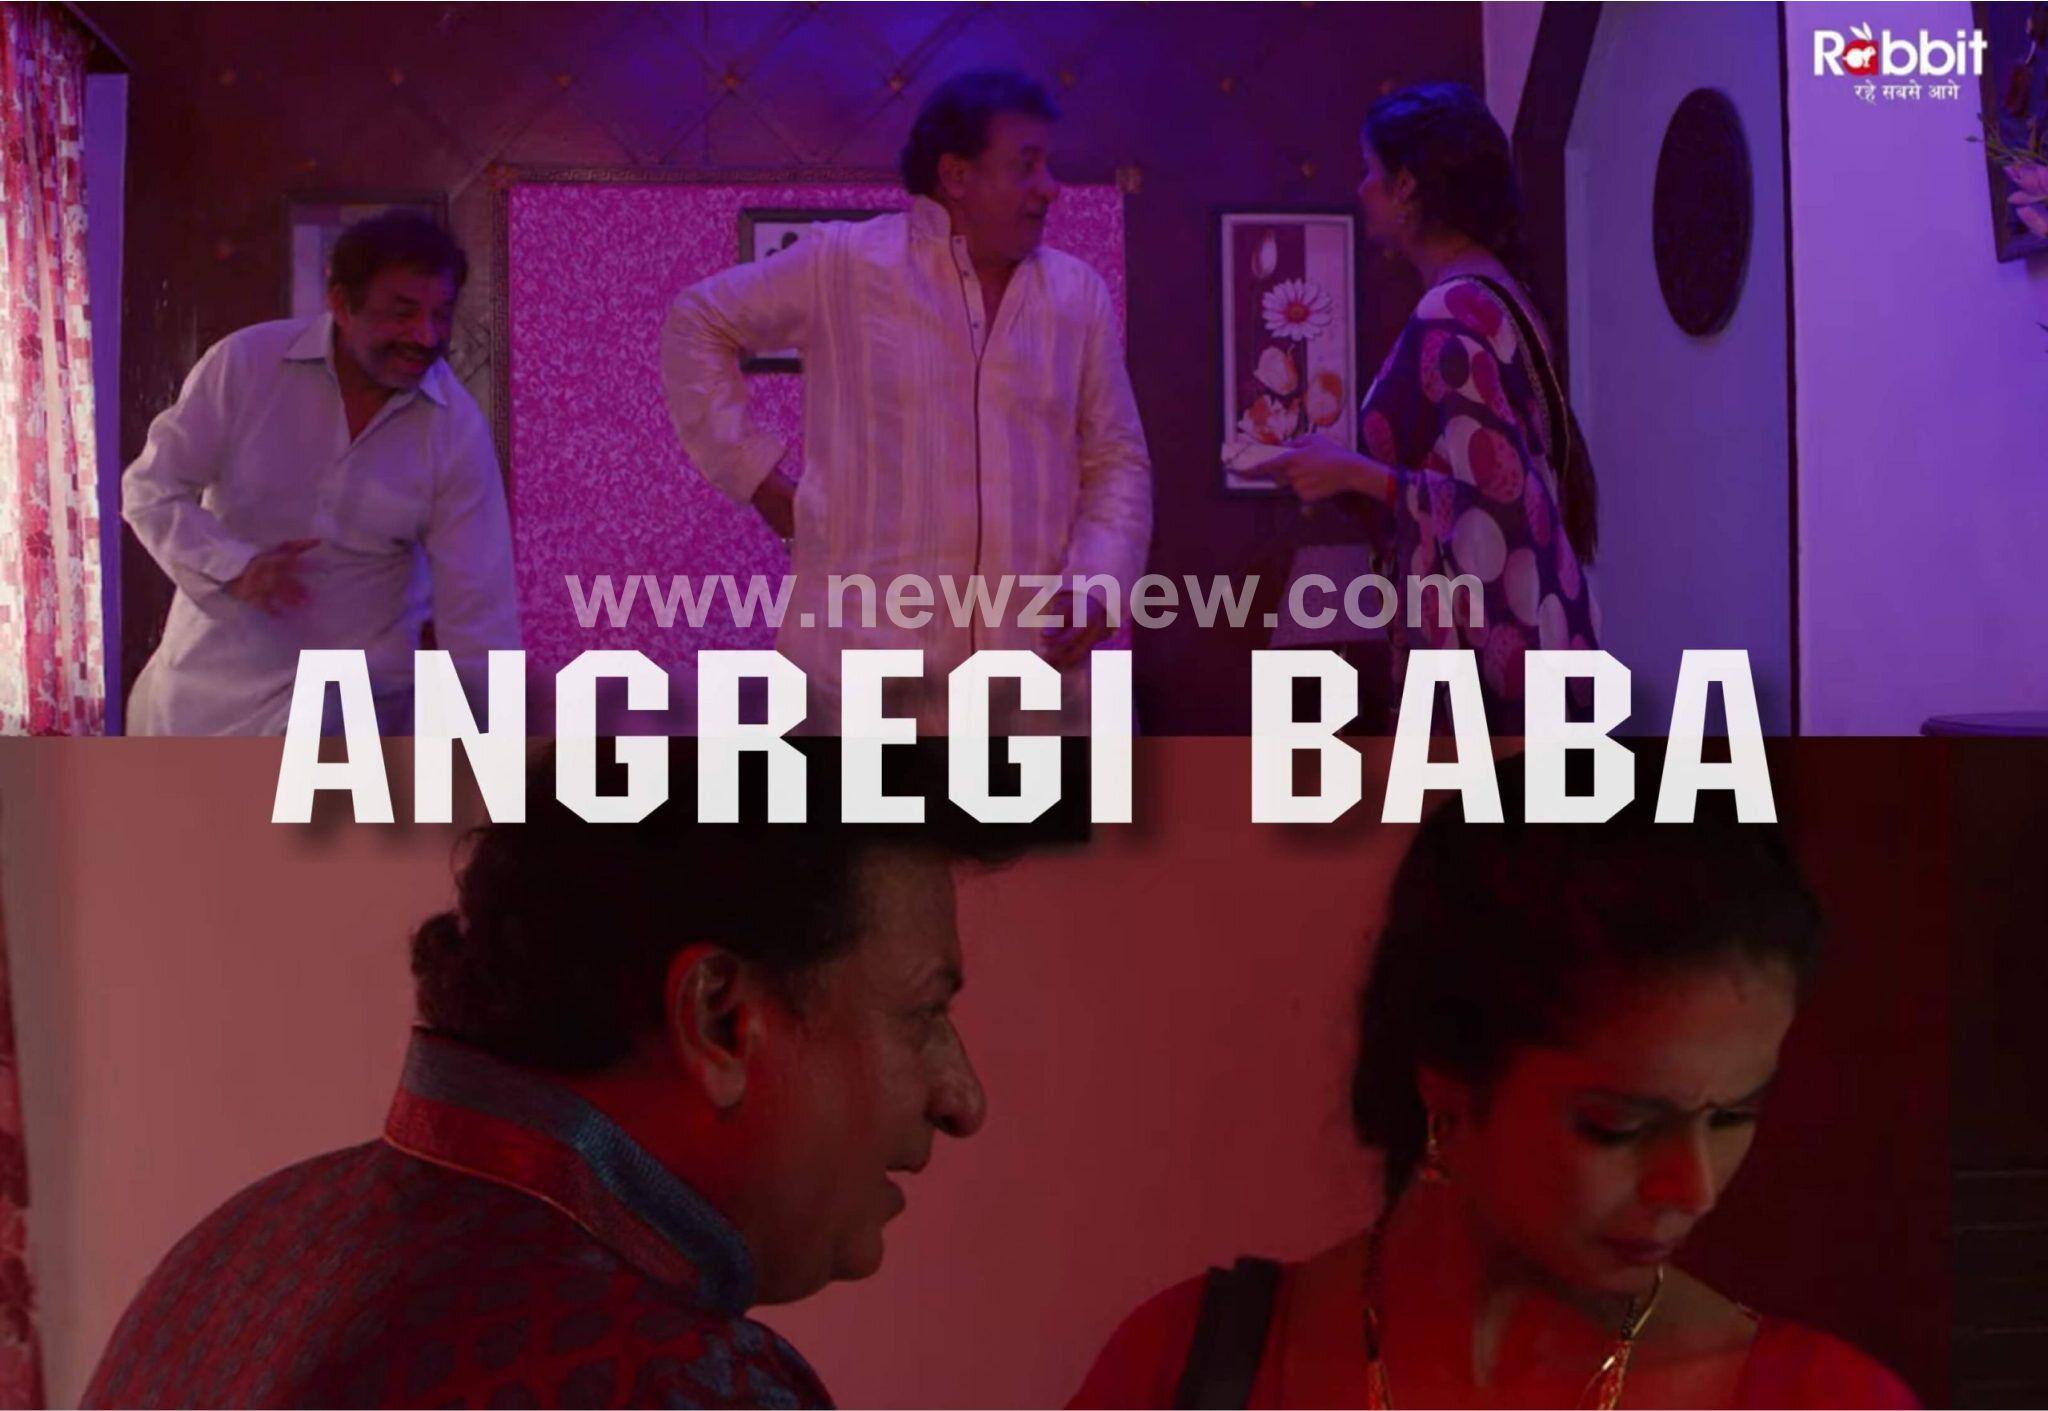 Watch Angregi Baba Web Series (2021) on Rabbit Movies